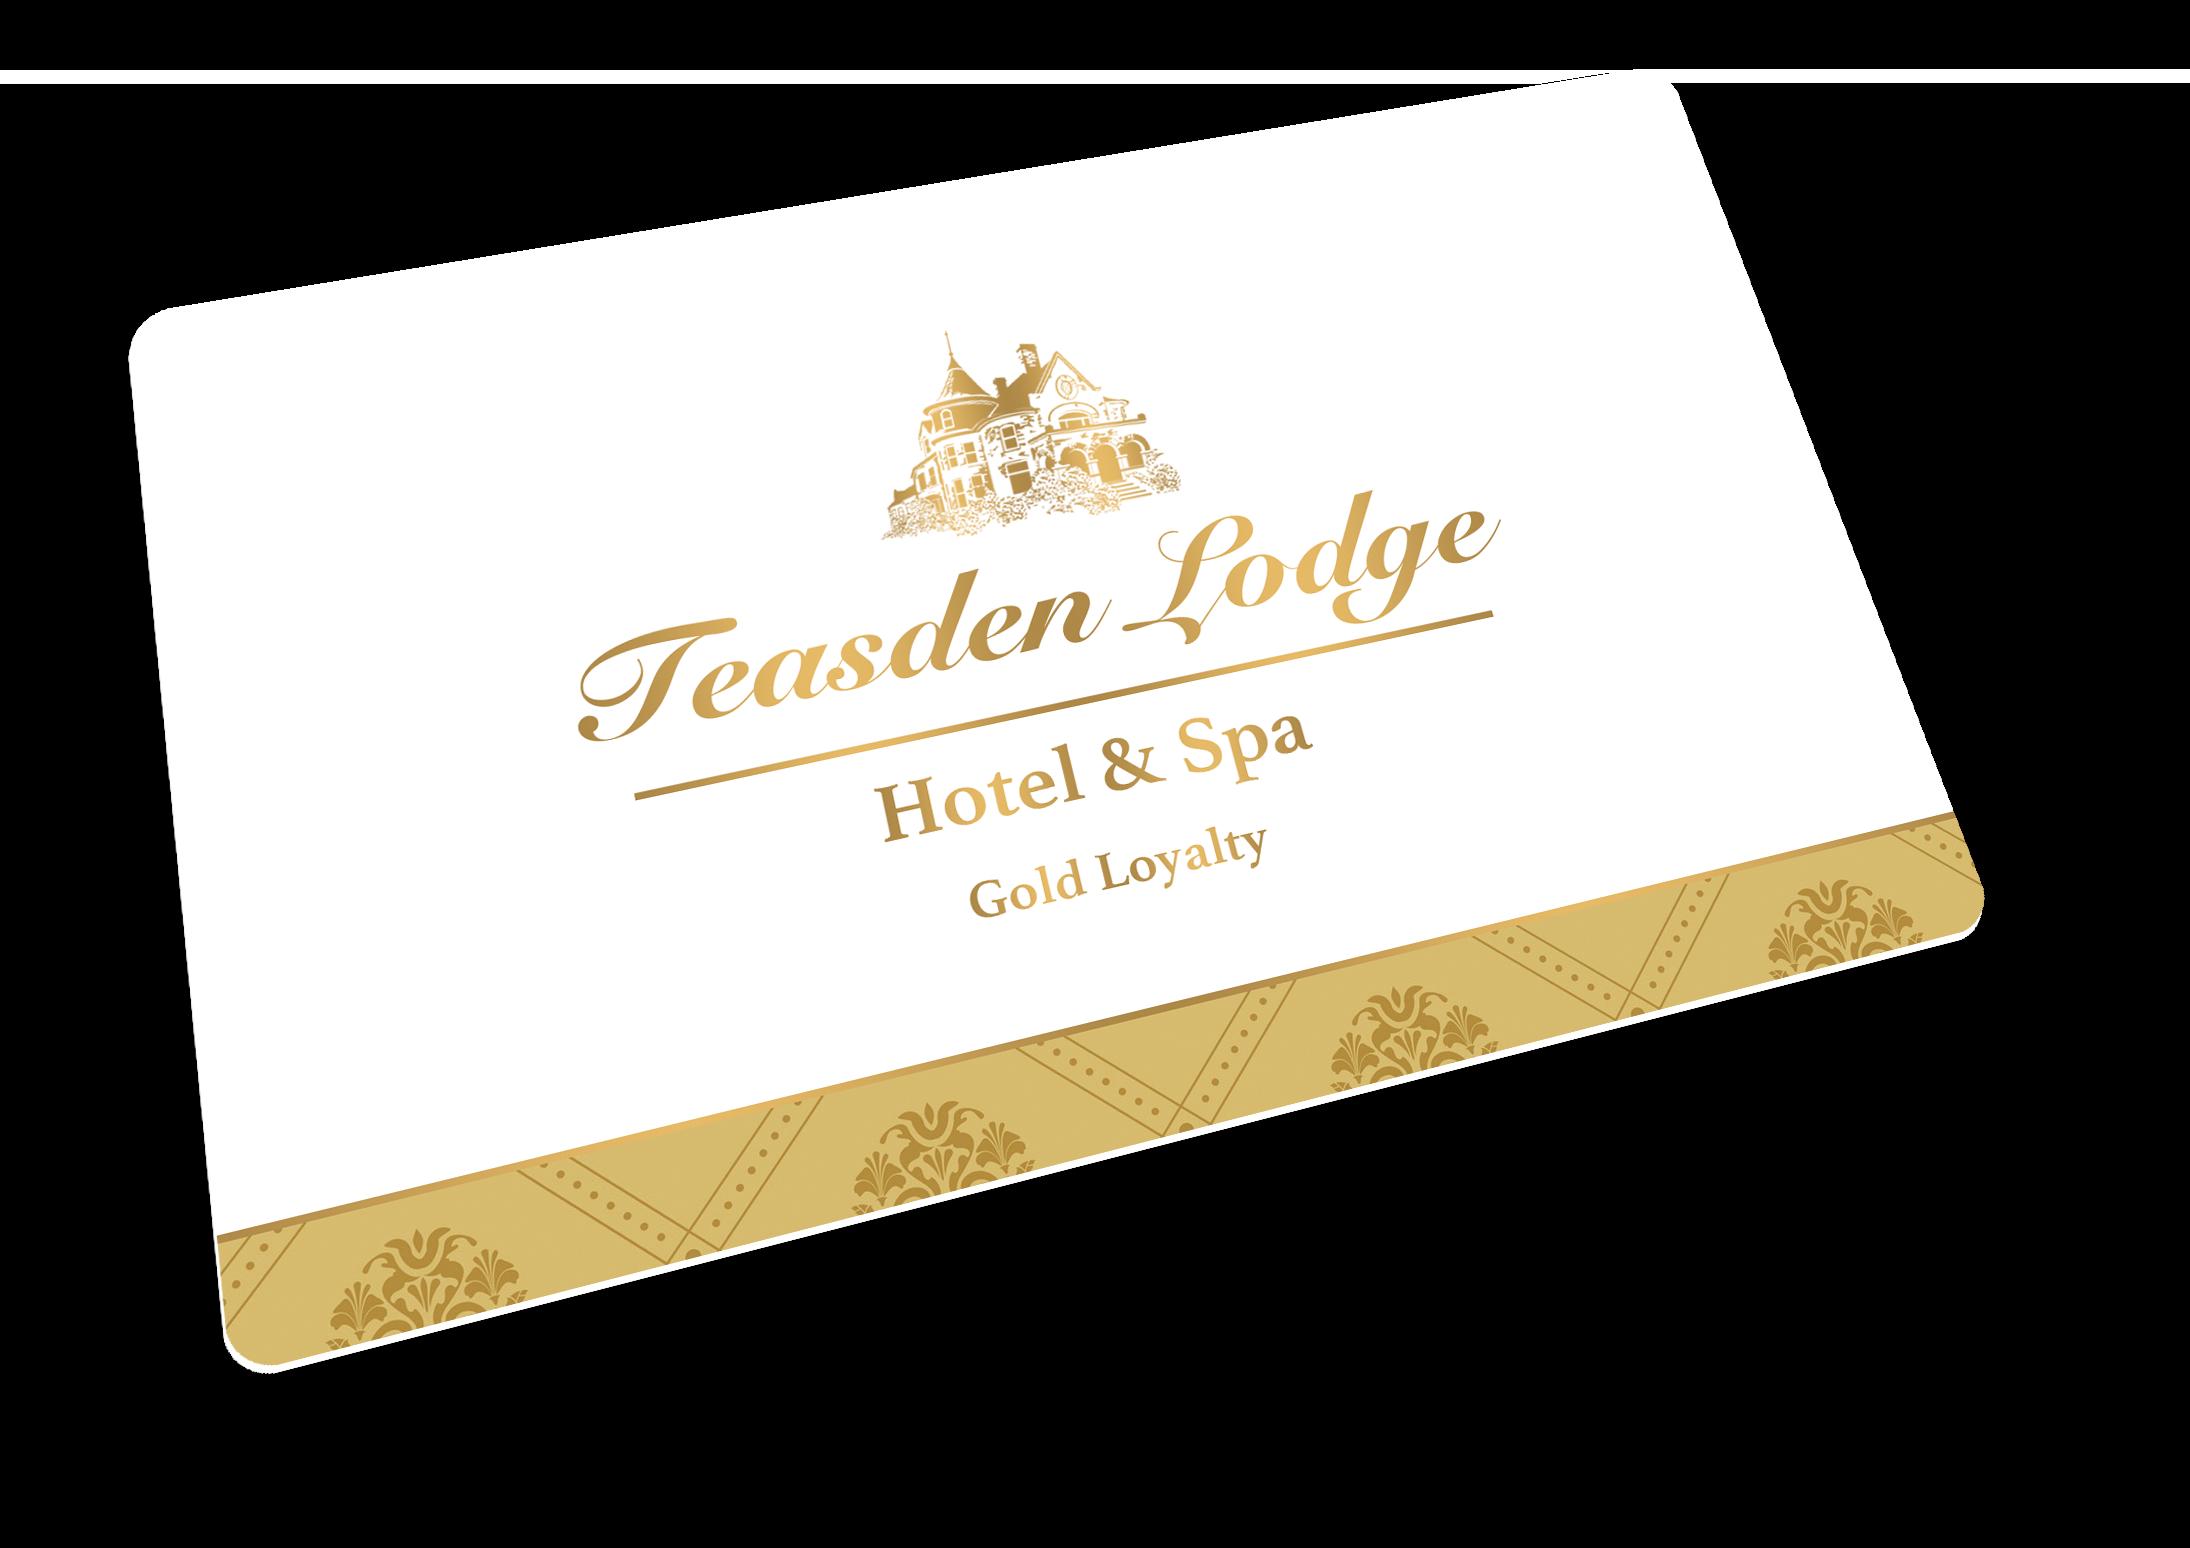 Teasden Lodge Hotel gold loyalty card